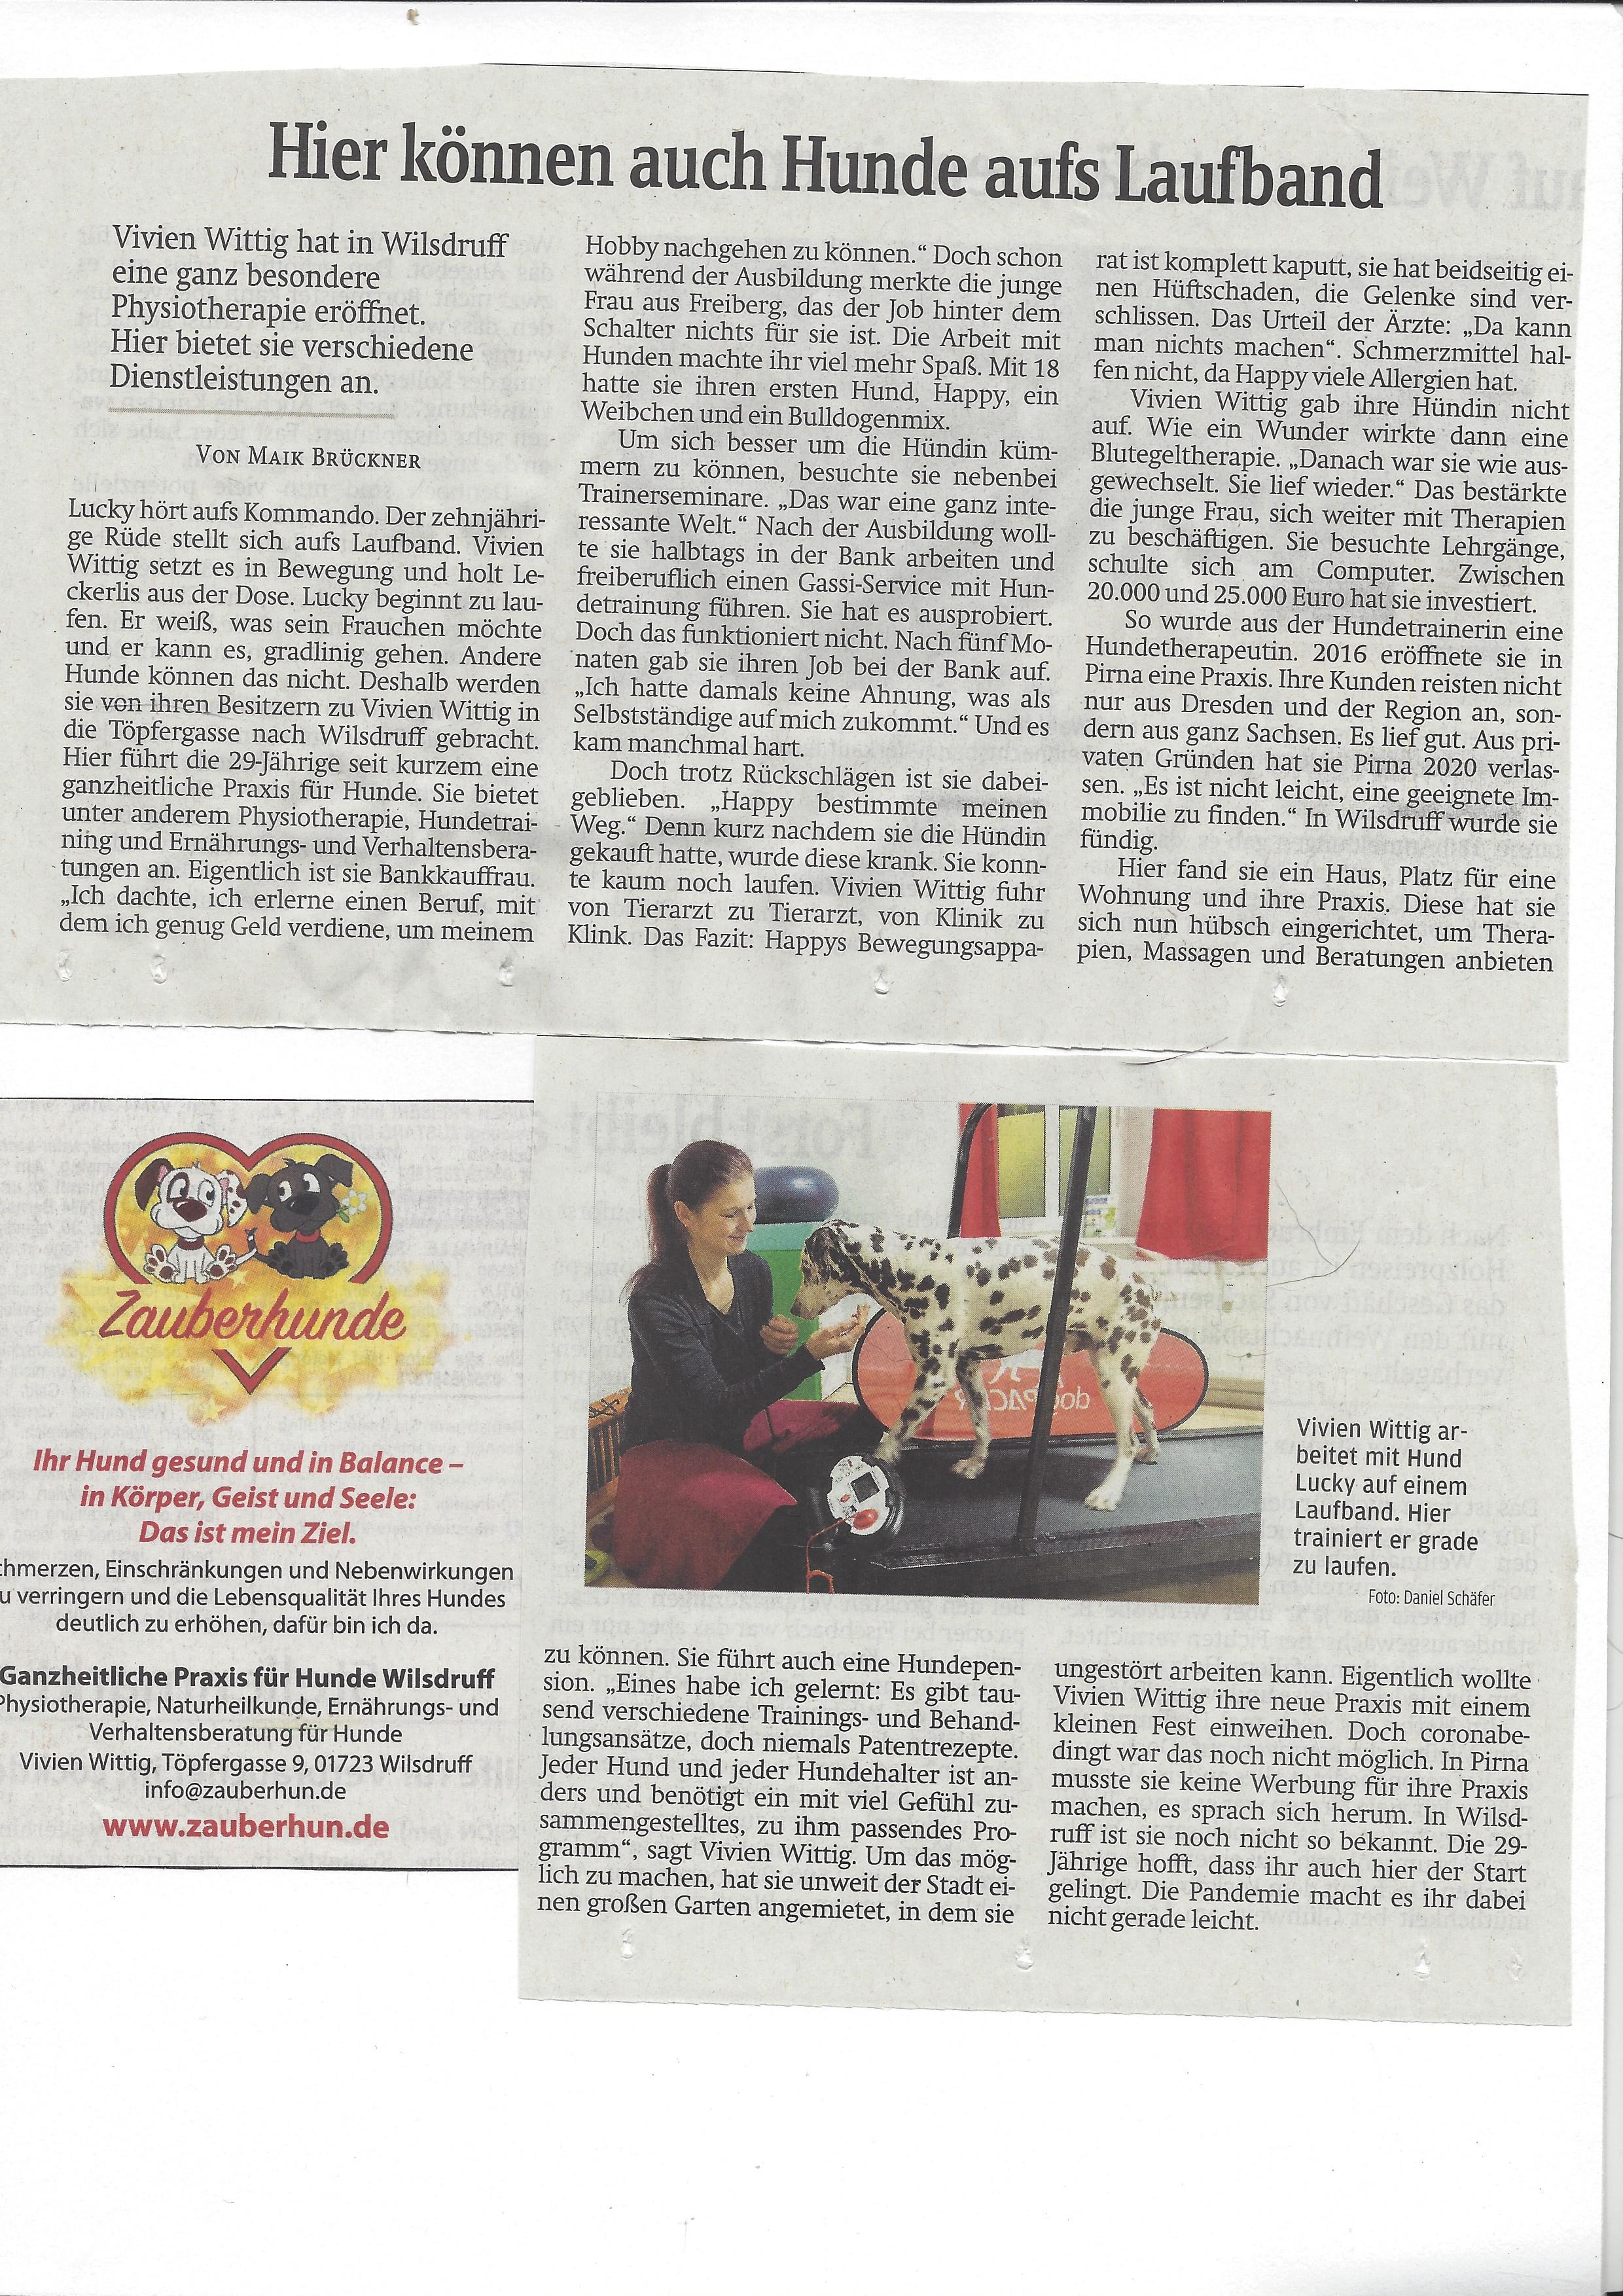 Zauberhunde  Zeitungsartikel Hundepension Hundephysio Tierheilpraxis Wilsdruff Dresden